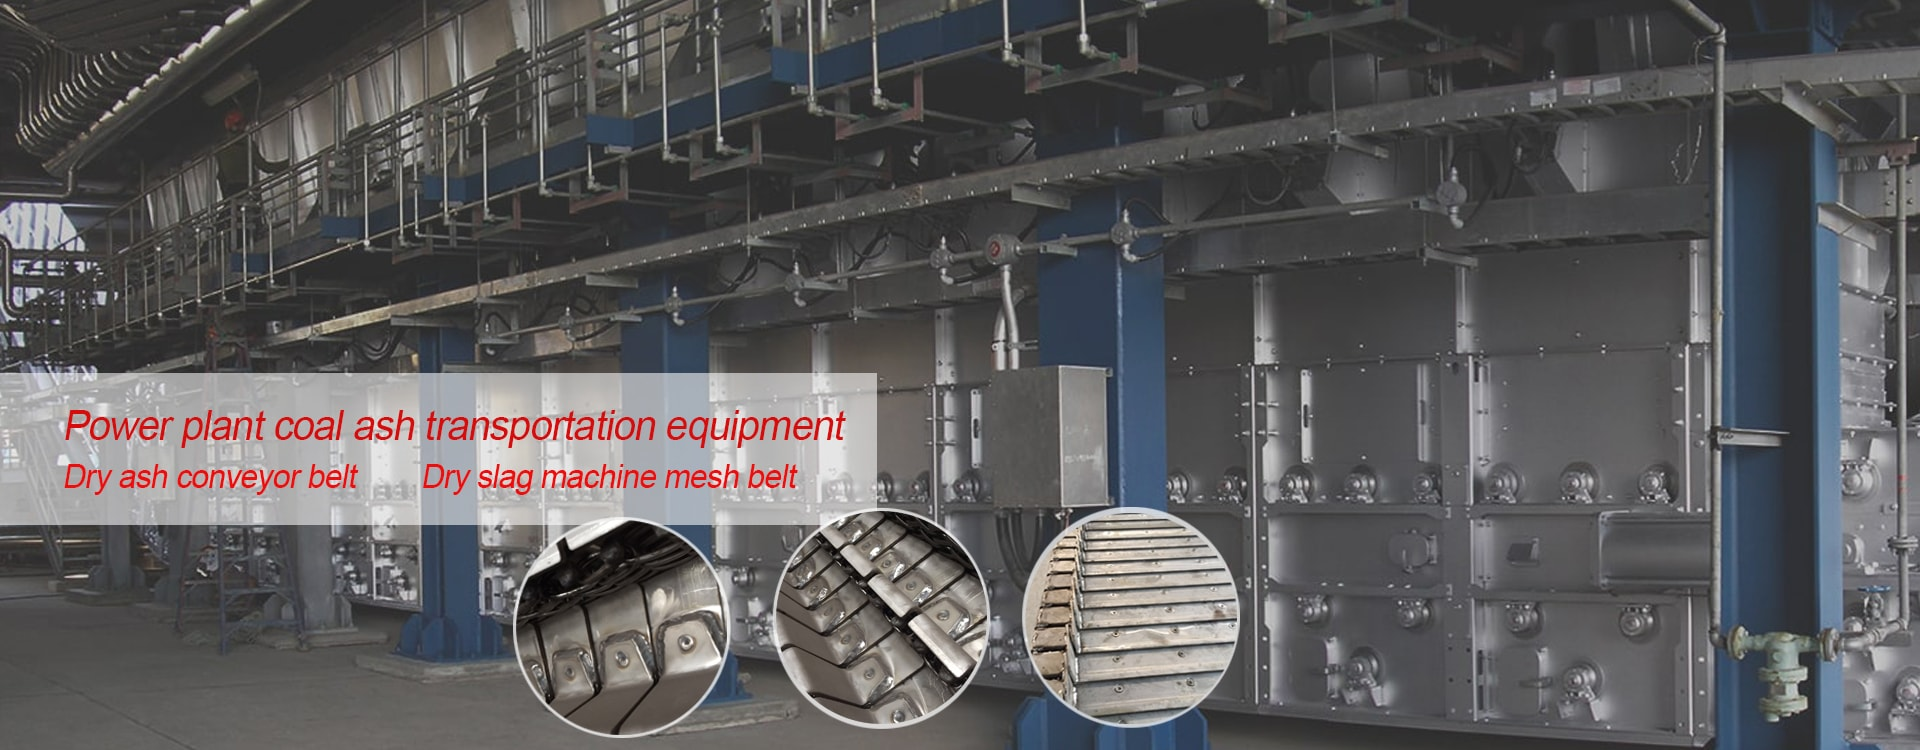 Dry ash conveyor belt, Dry Slag Machine Mesh Belt